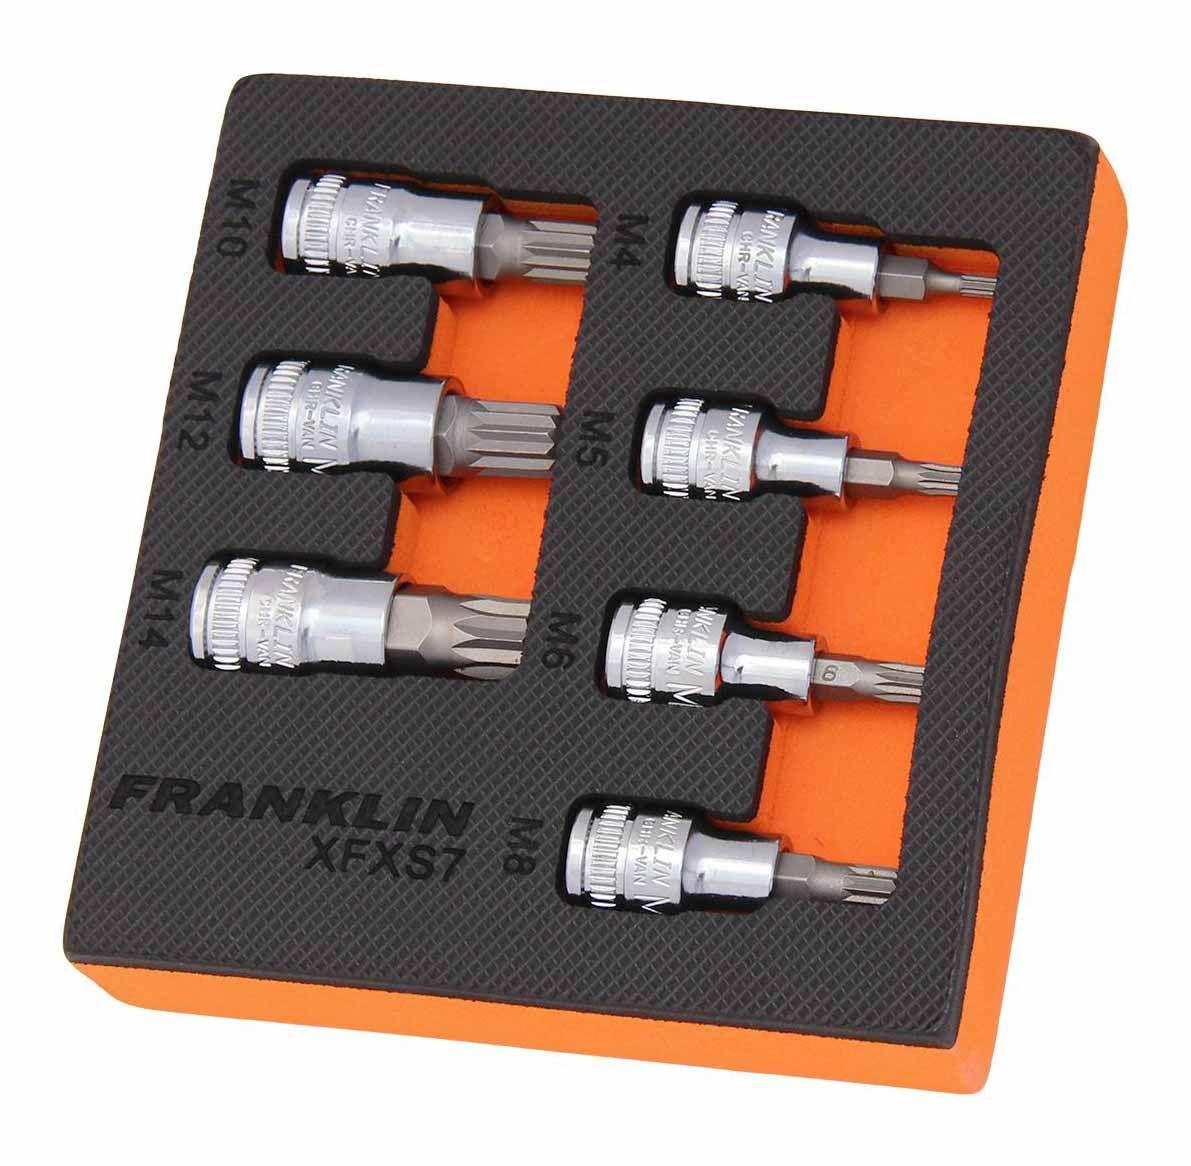 "Franklin XF 7 Piece Spline Bit Socket Set 3/8"" Drive"